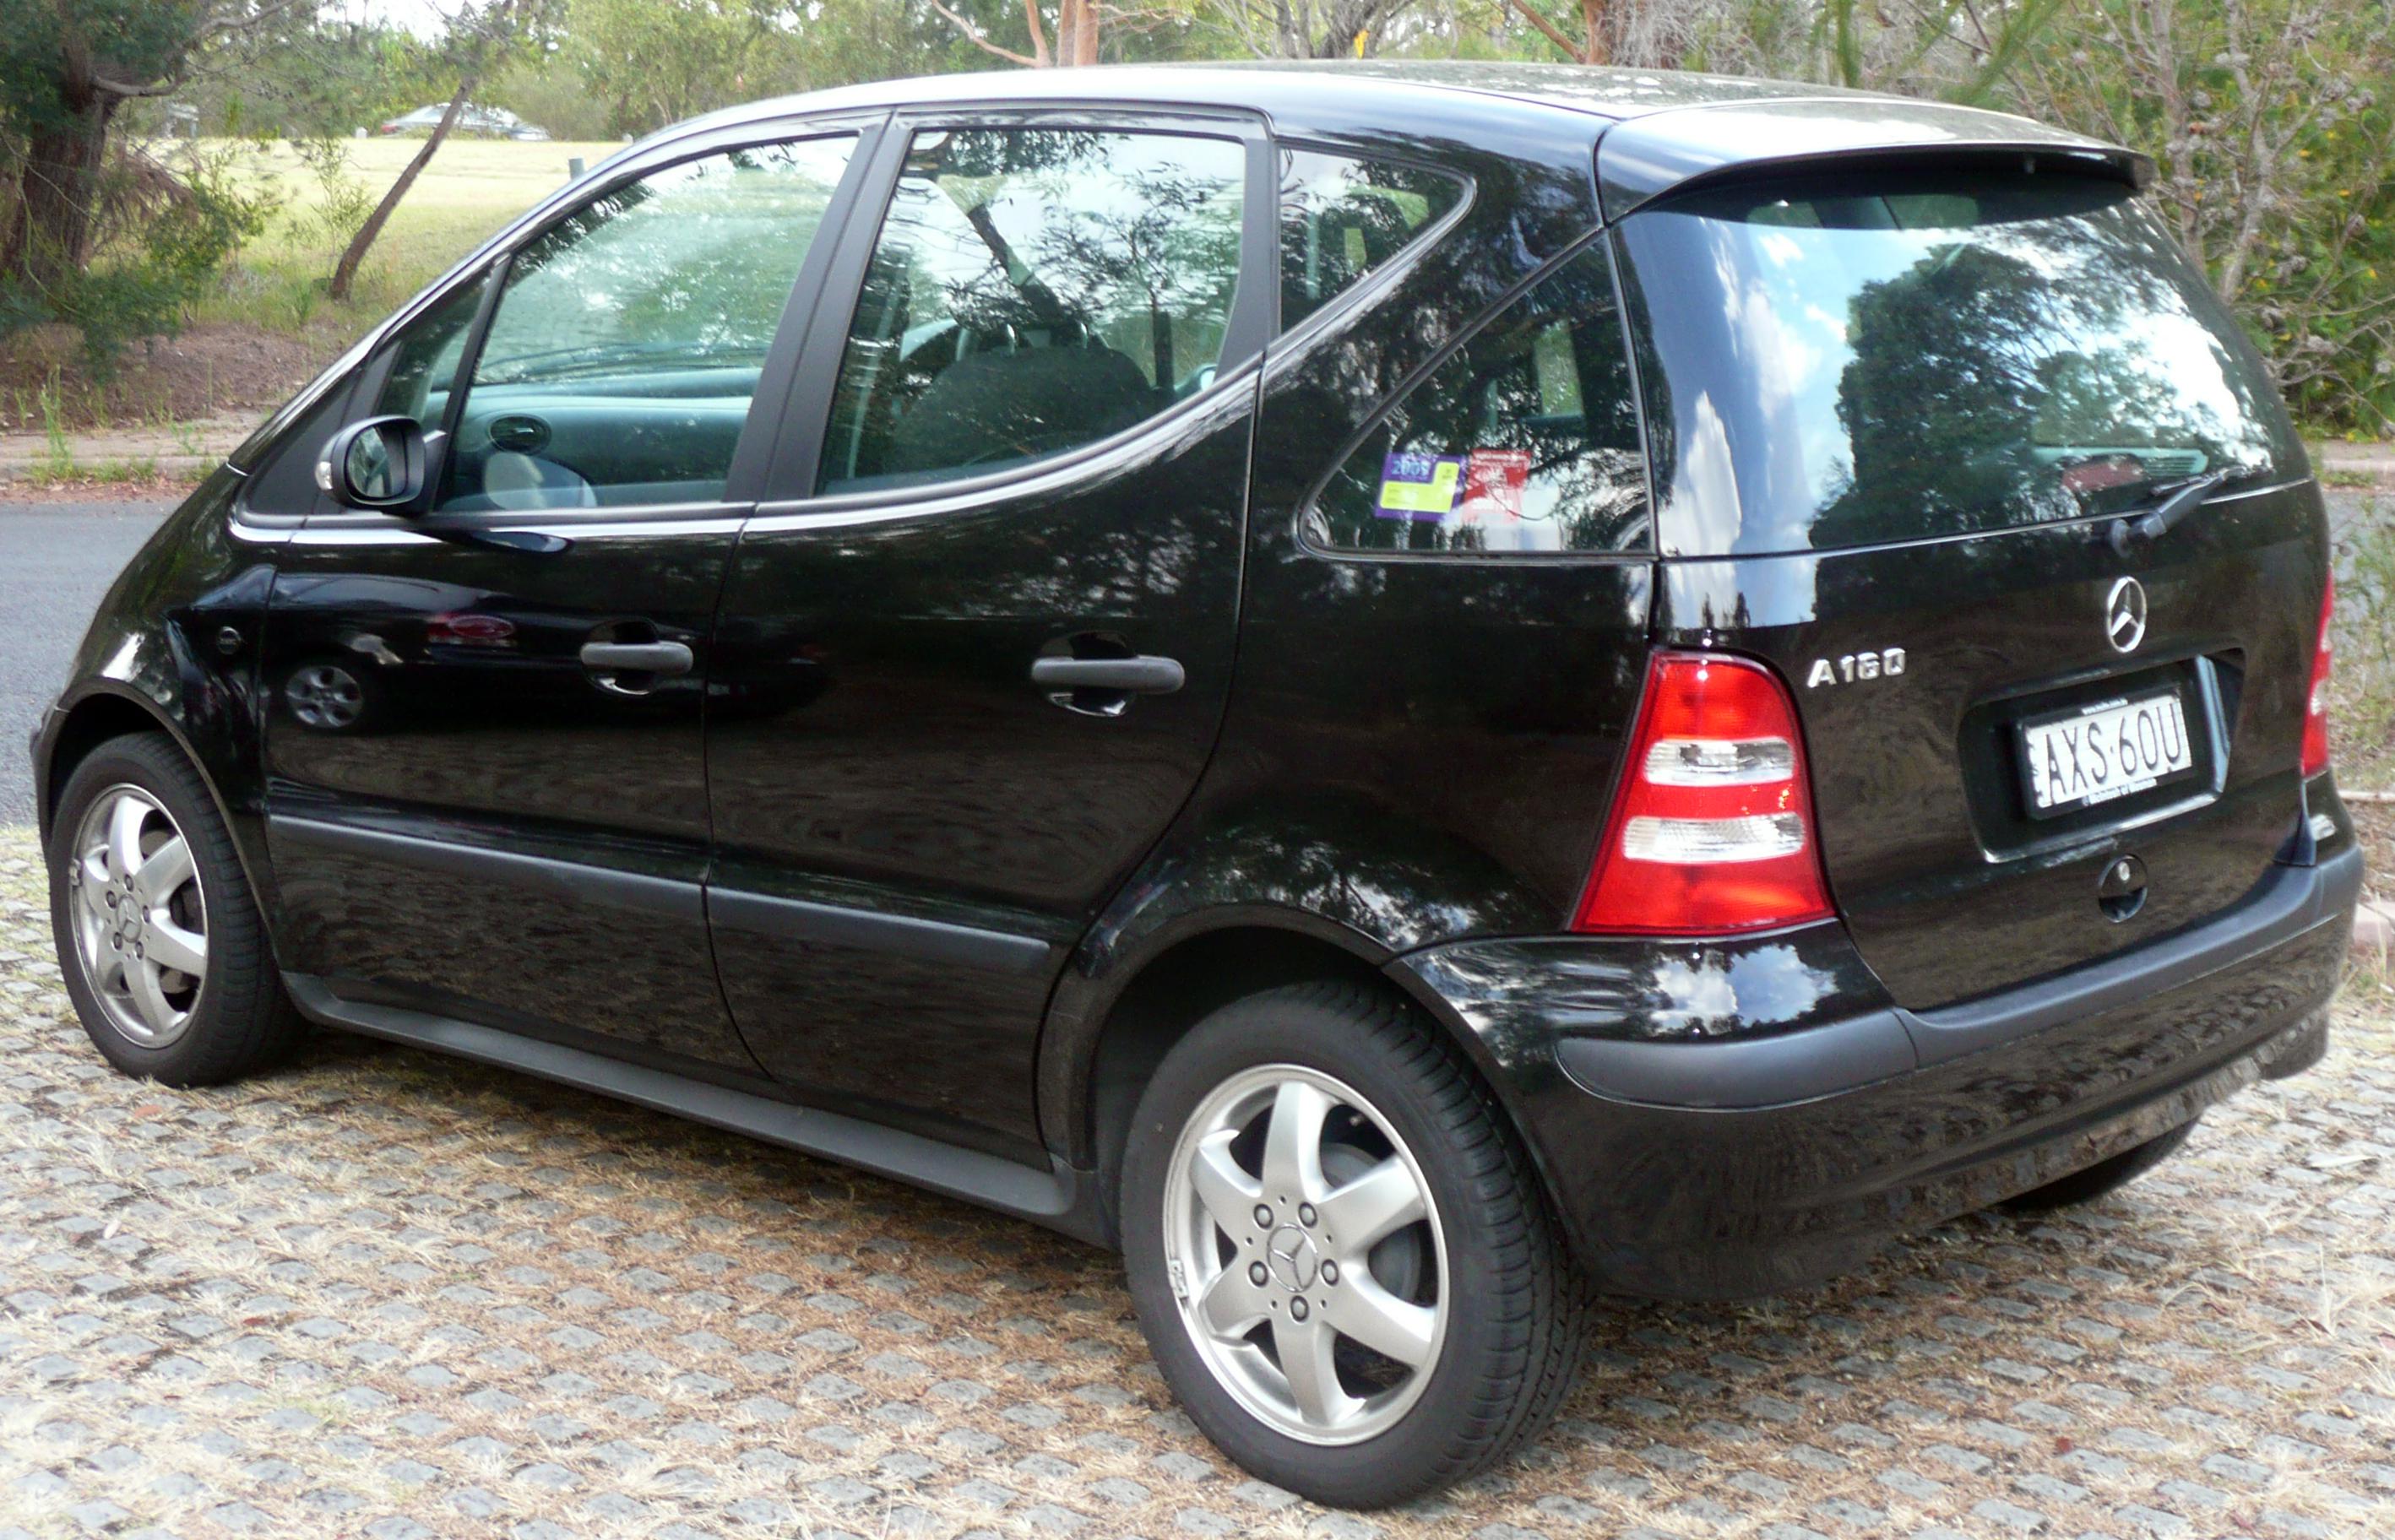 file 2003 2004 mercedes benz a 160 w 168 my03 5 classic hatchback 2009 01 15. Black Bedroom Furniture Sets. Home Design Ideas